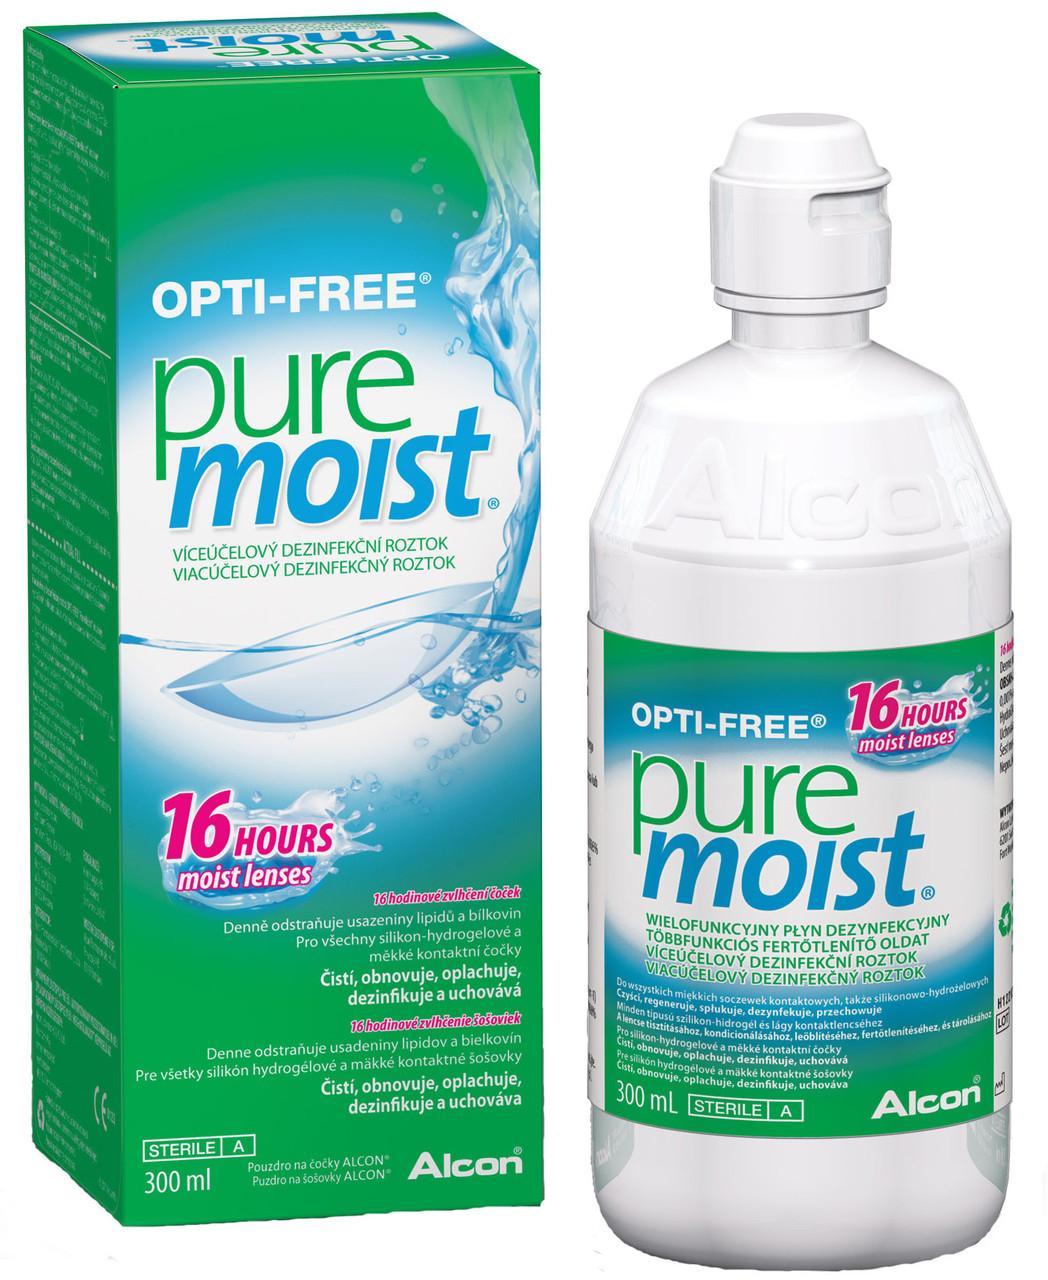 Раствор для контактных линз Alcon Opti Free Pure Moist 300 мл - фото 3